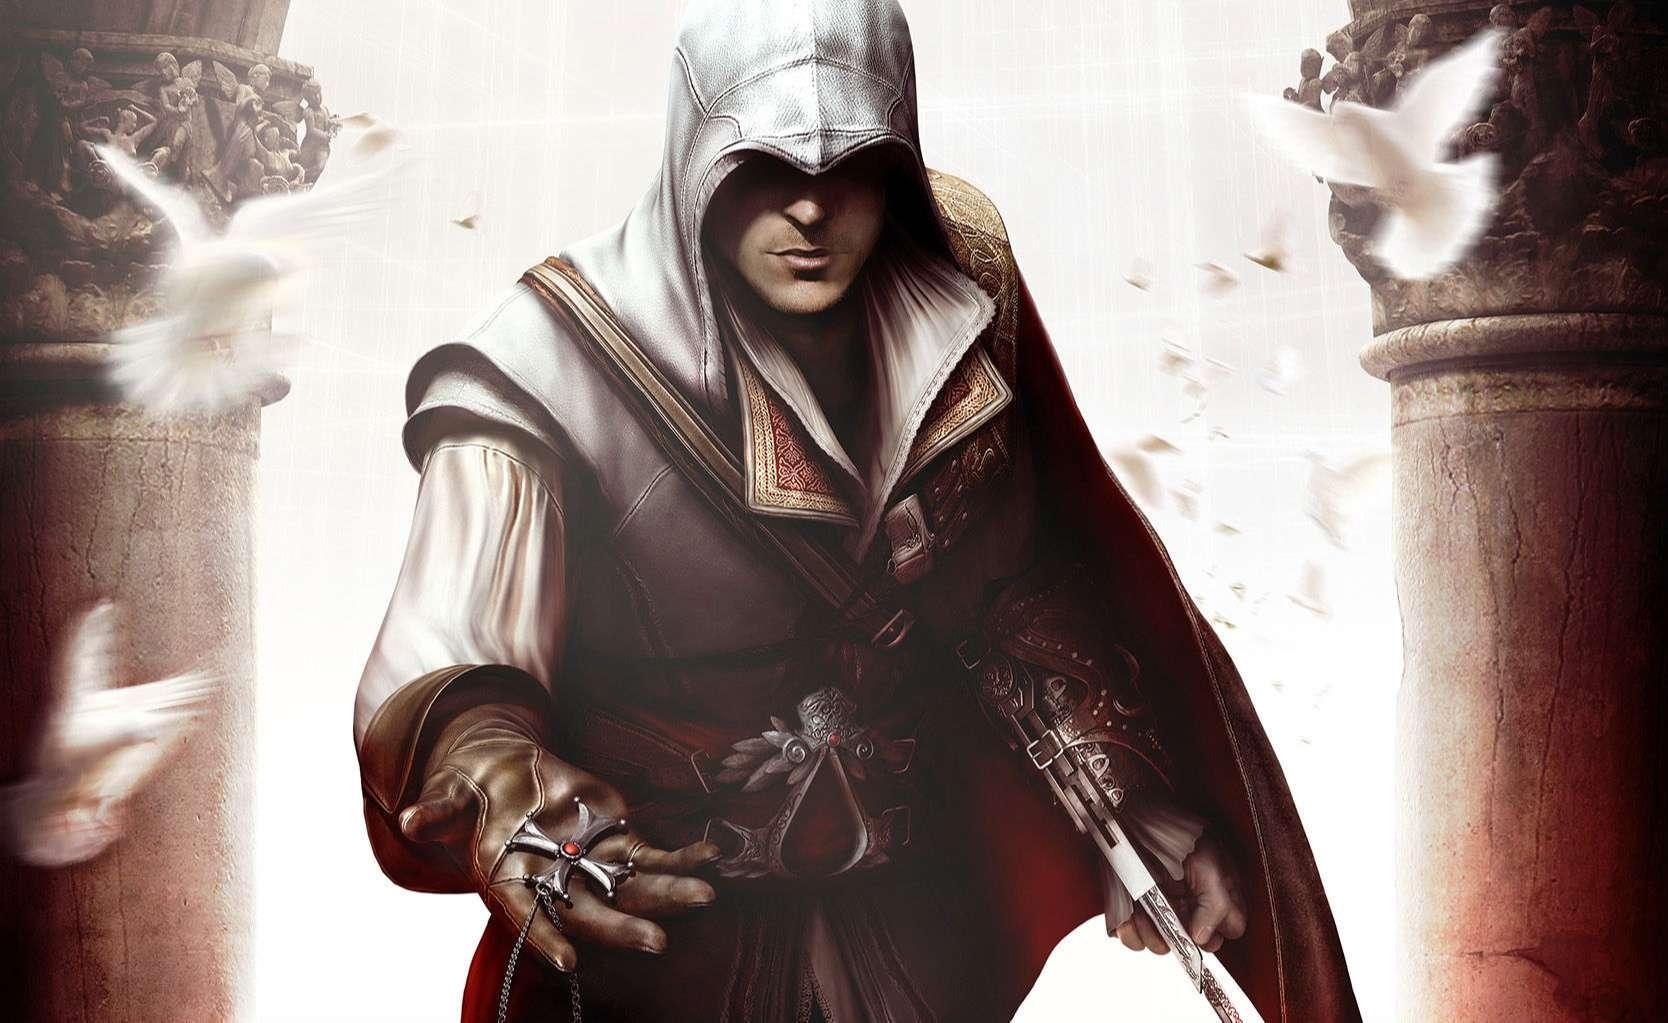 Assain Creed Video Game Wallpaper 006